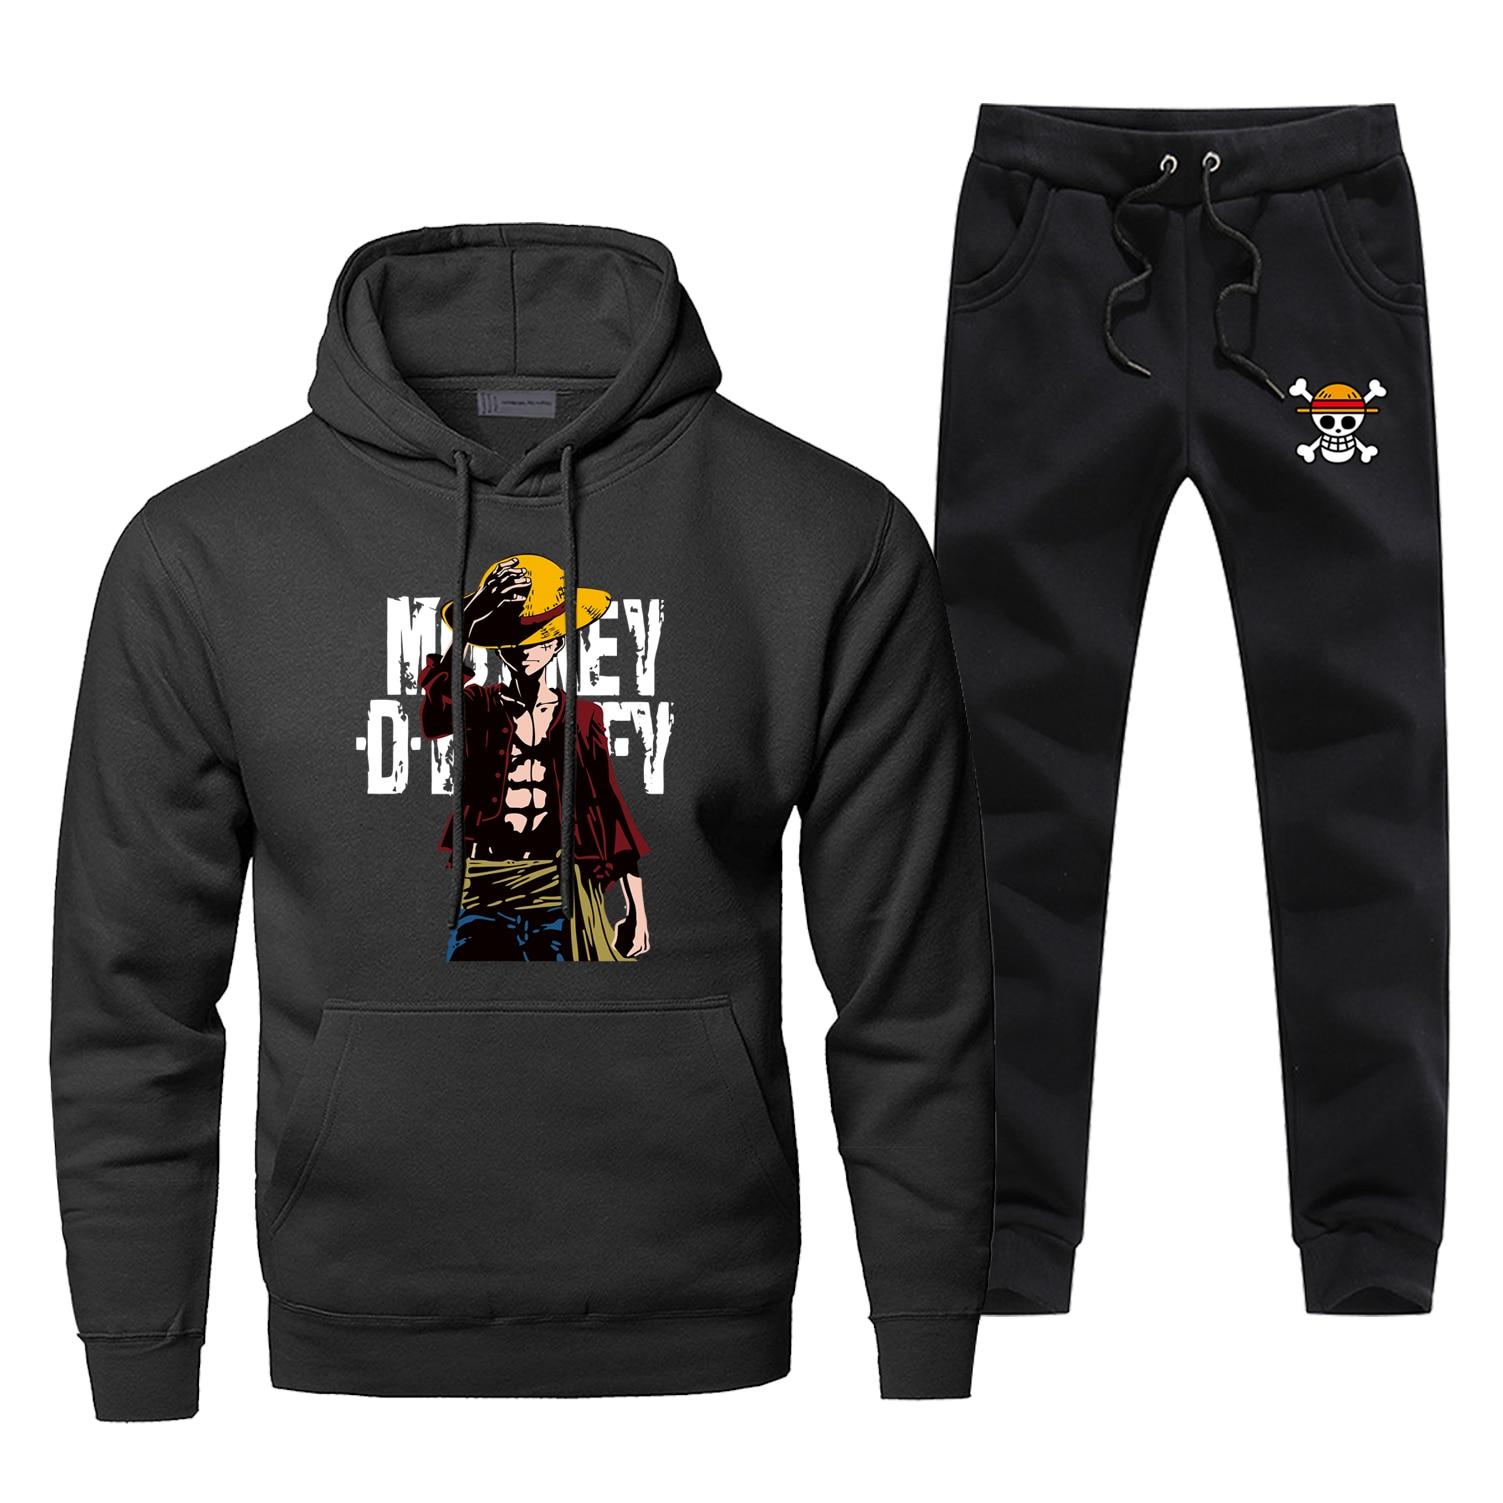 Luffy One Piece Hoodies Pants Set Men Sets Japan Anime Suit Pant Sweatshirt Sweatpants Sportswear Autumn Hoody 2 PCS Tracksuit